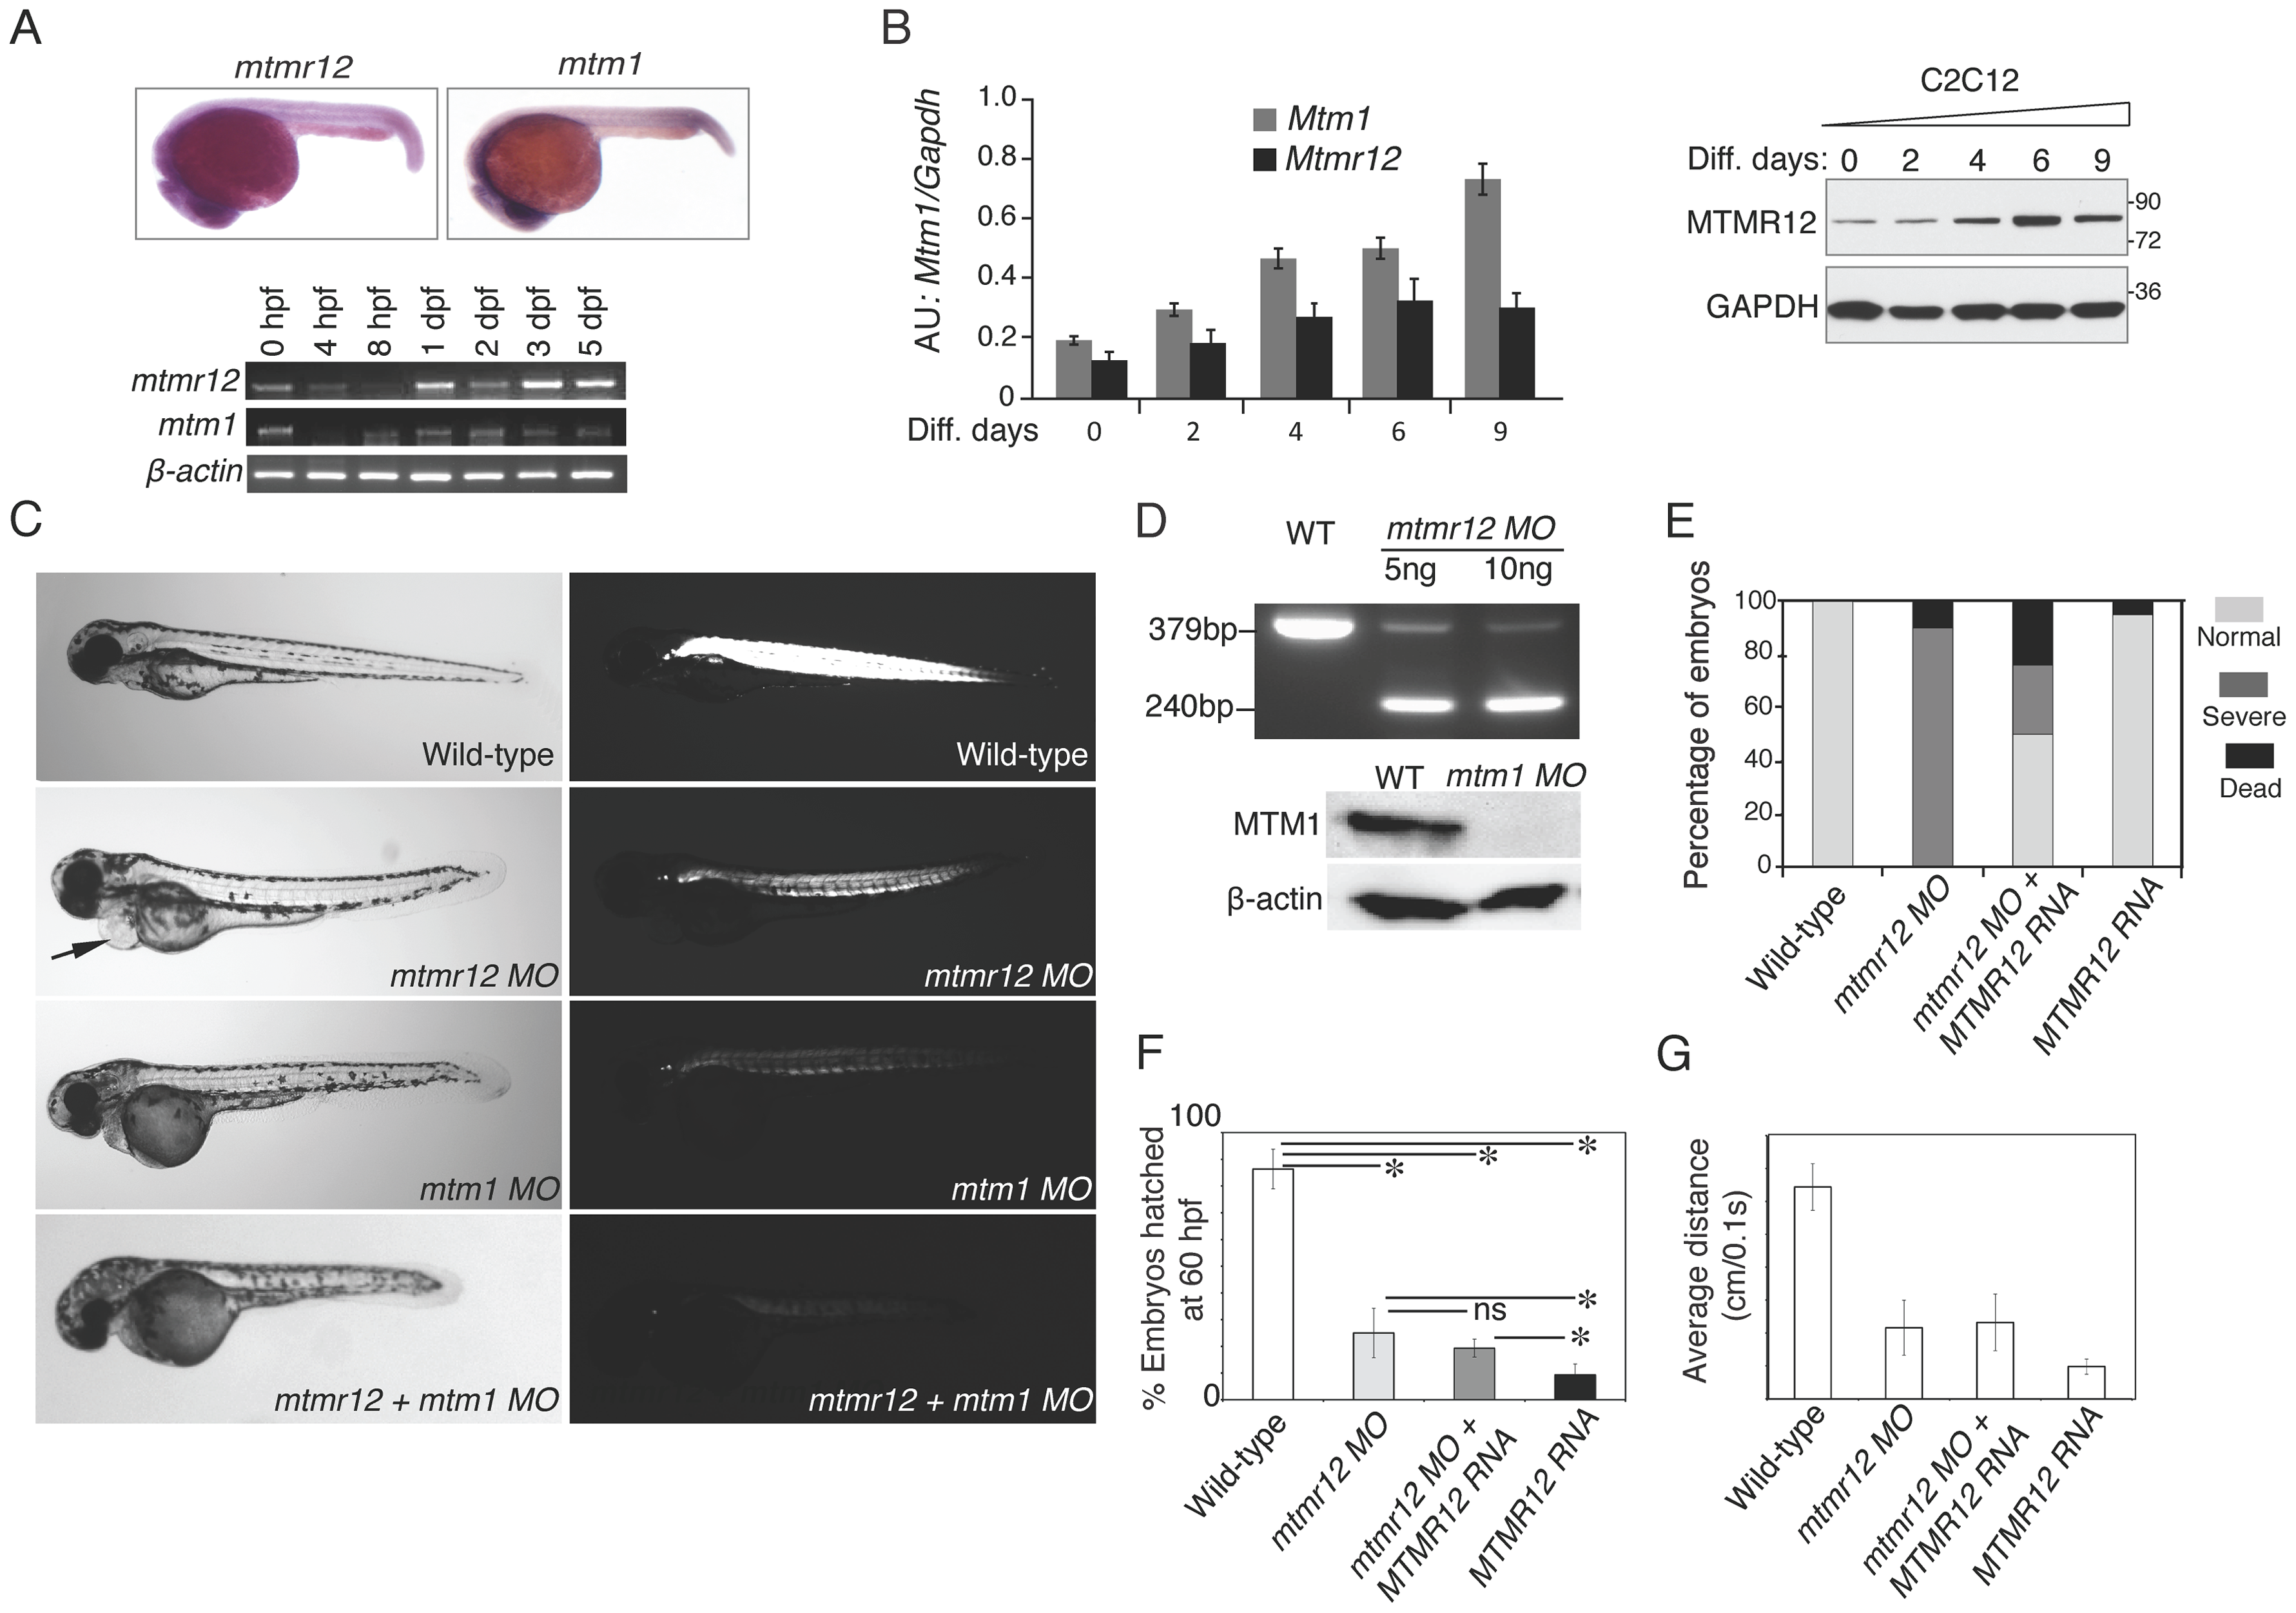 Expression patterns and morpholino-based knockdown of <i>mtmr12</i> in developing zebrafish.